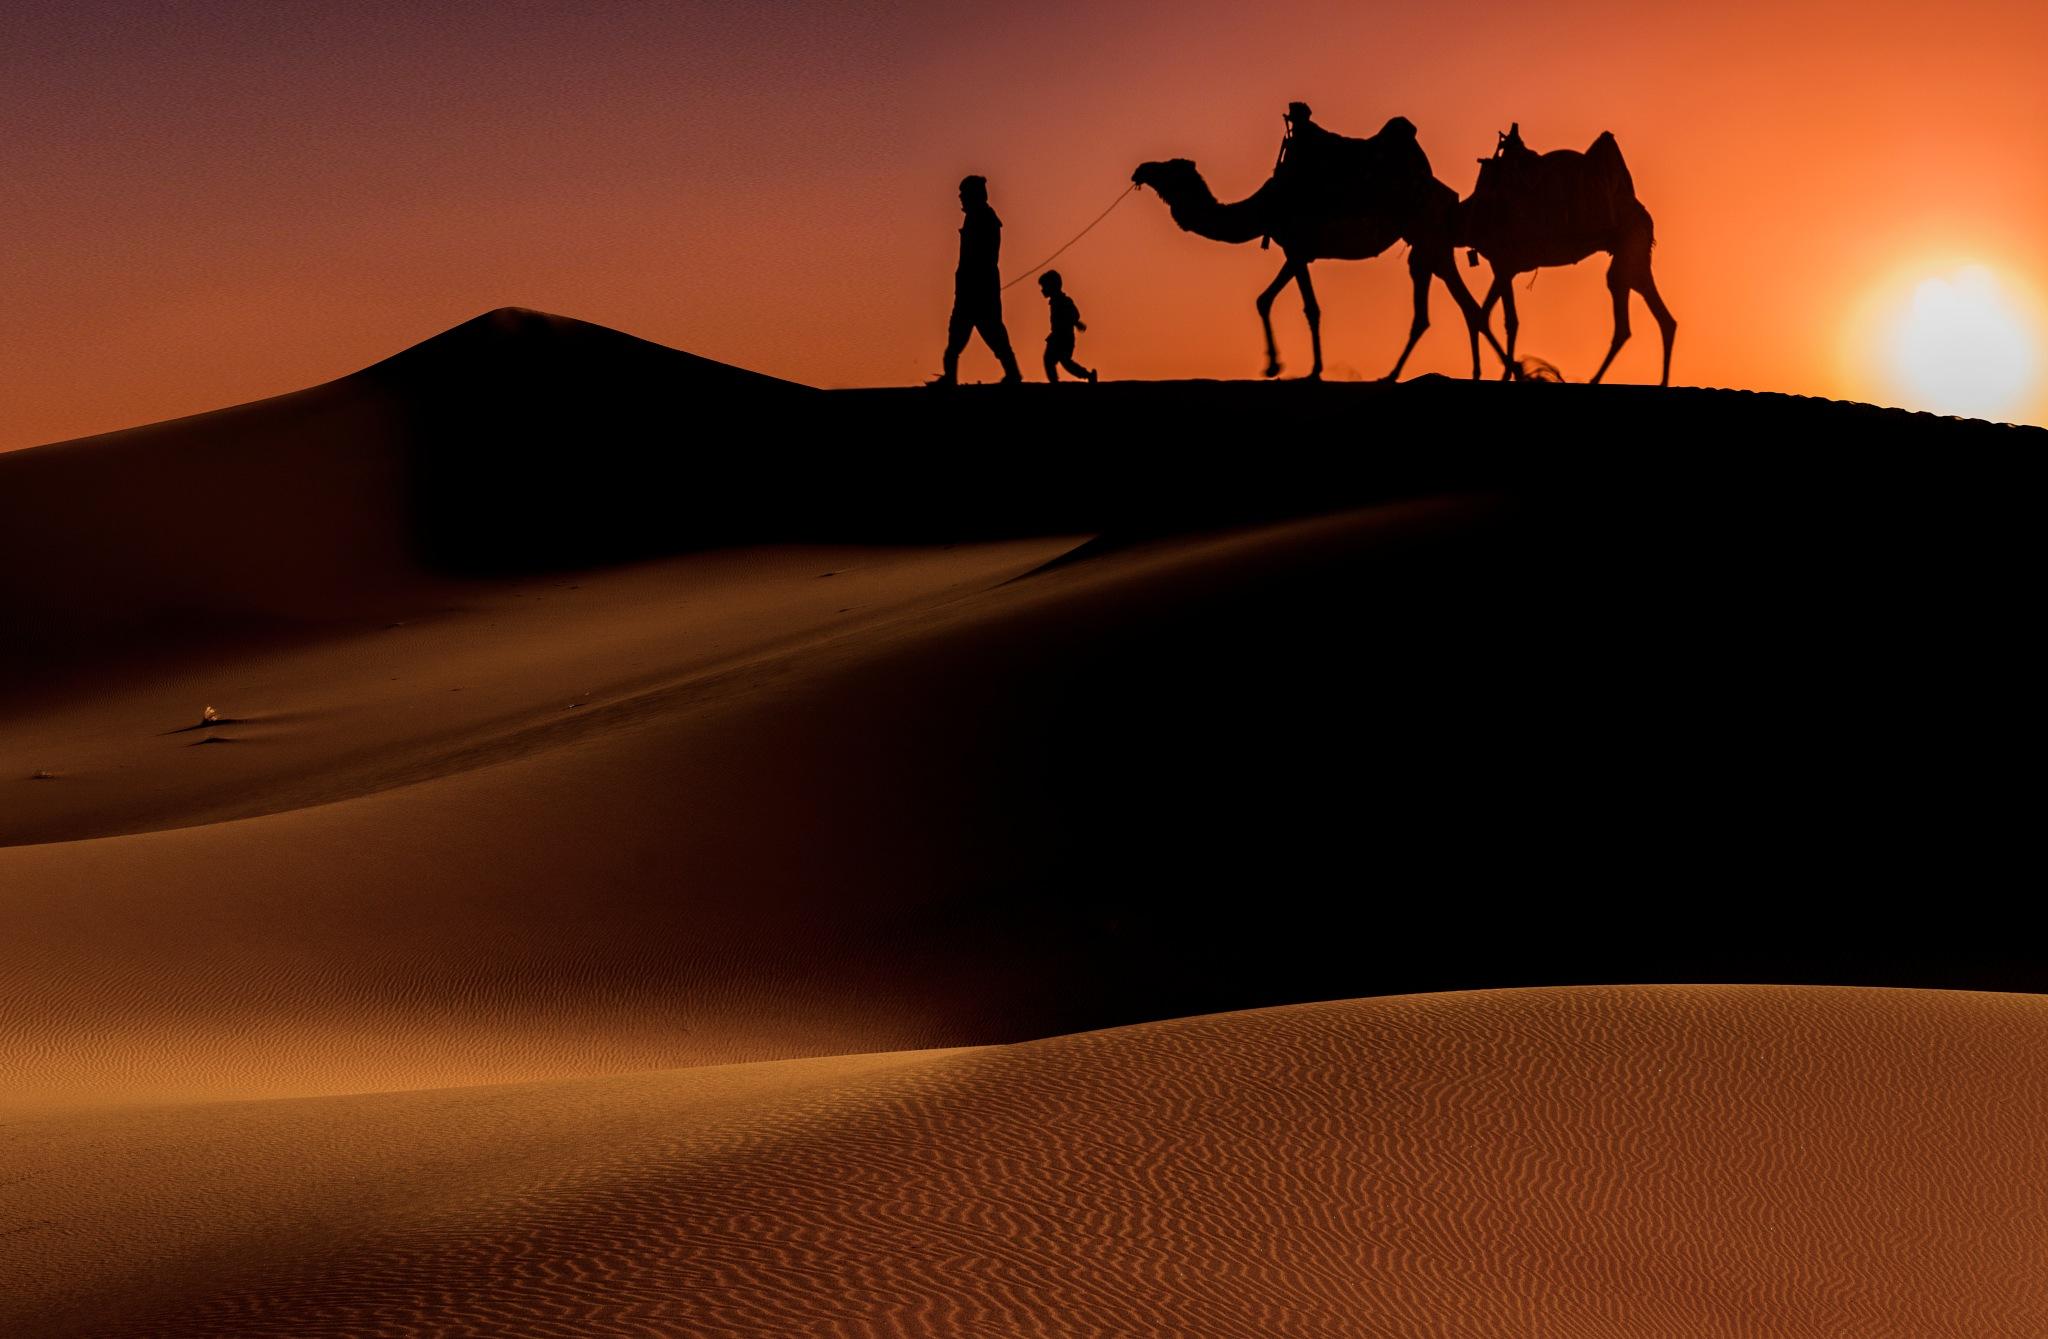 Desert life by Shahriar Dabiri